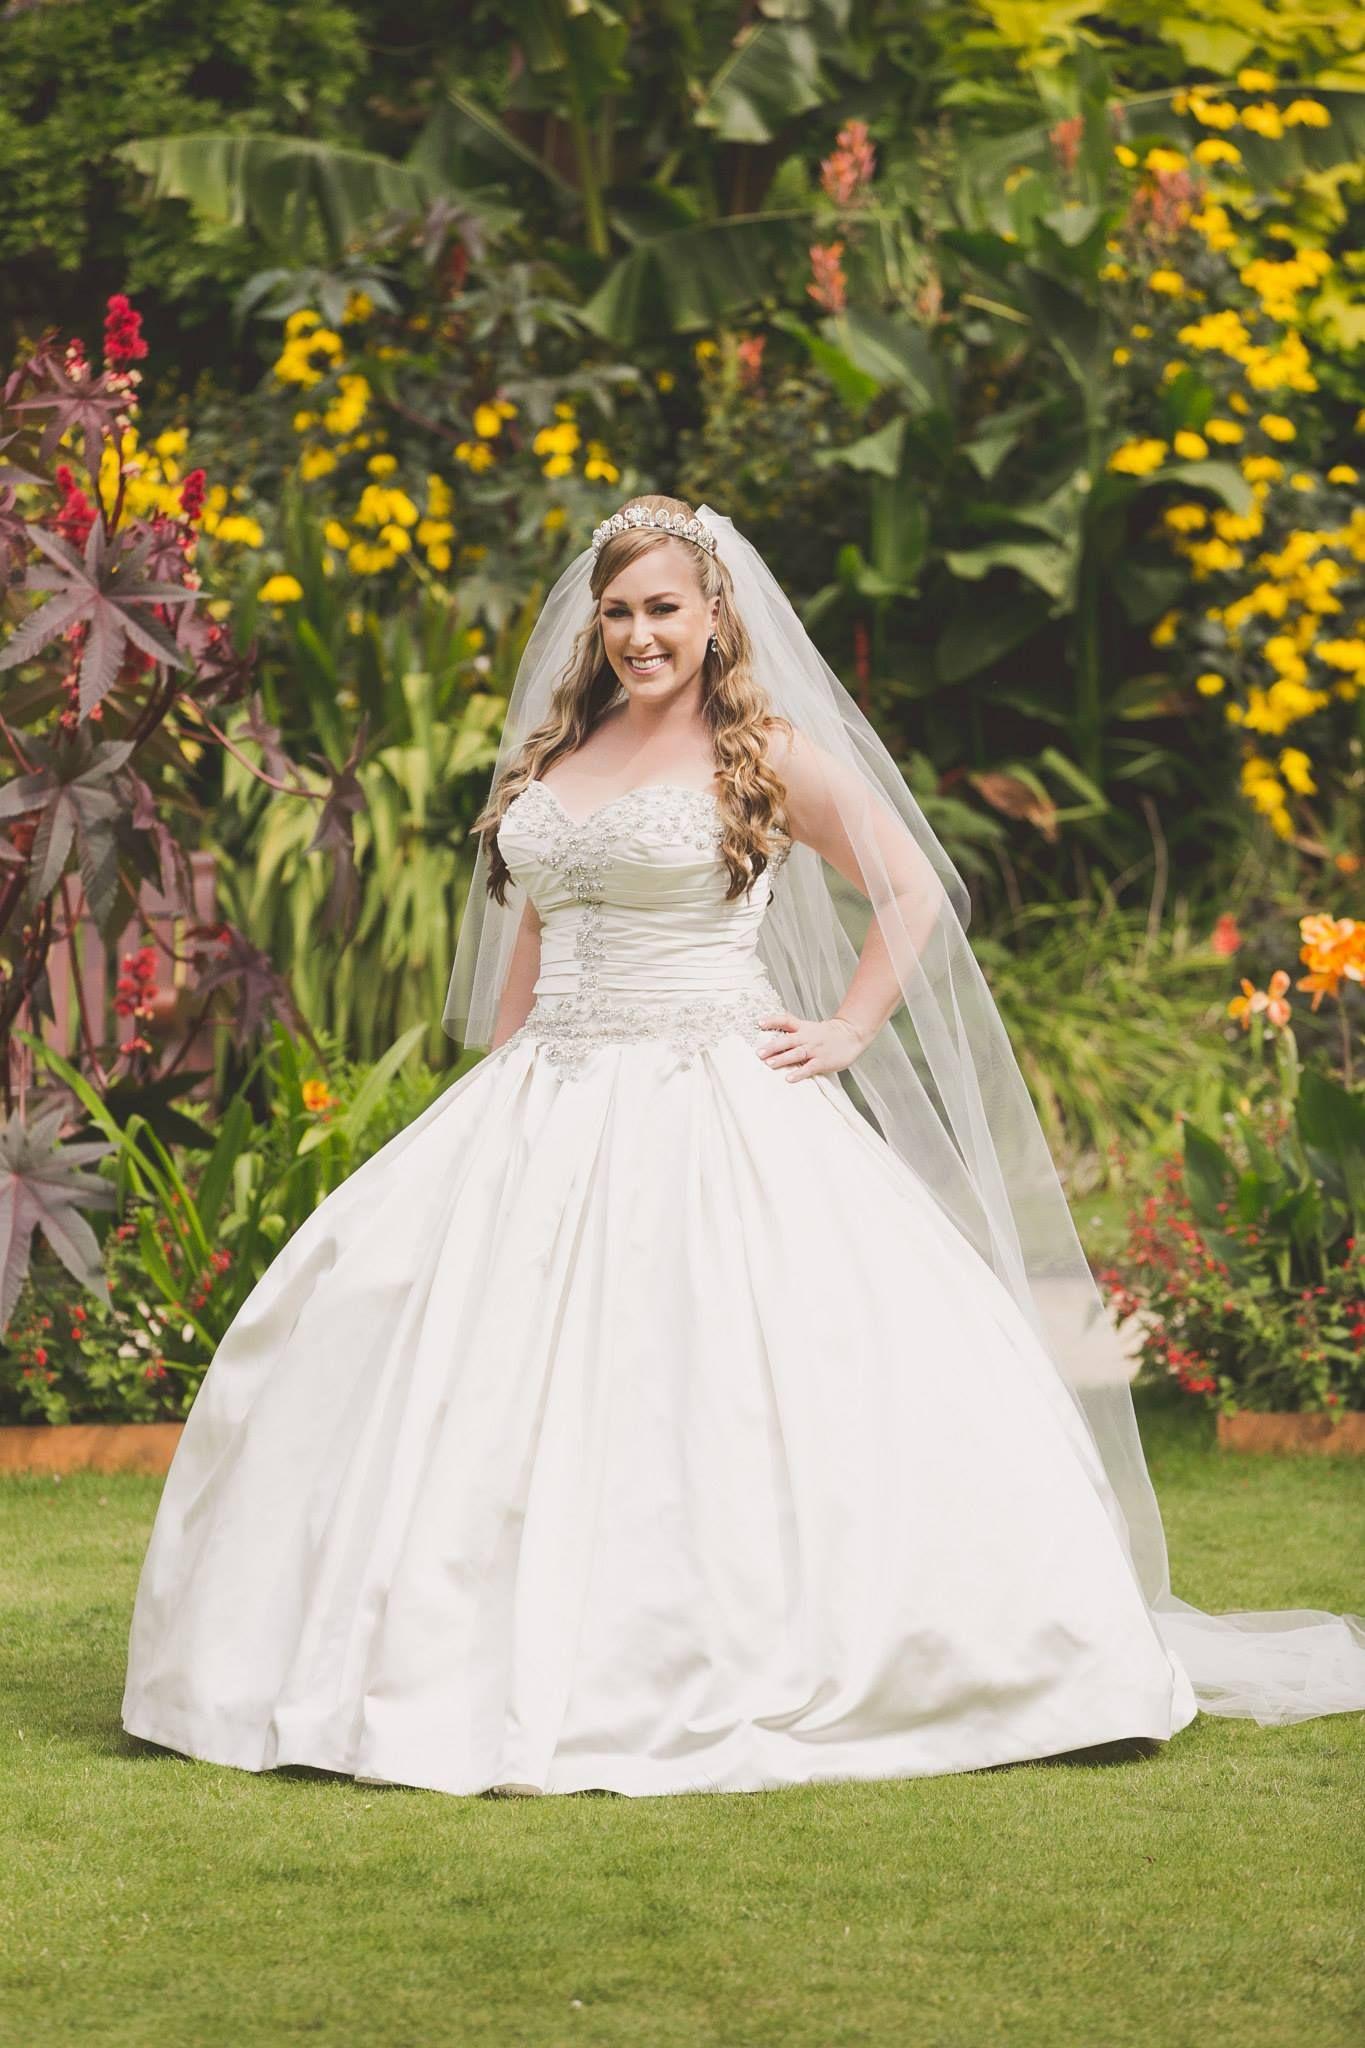 Princess wedding dress Satin, pearl and crystal beaded